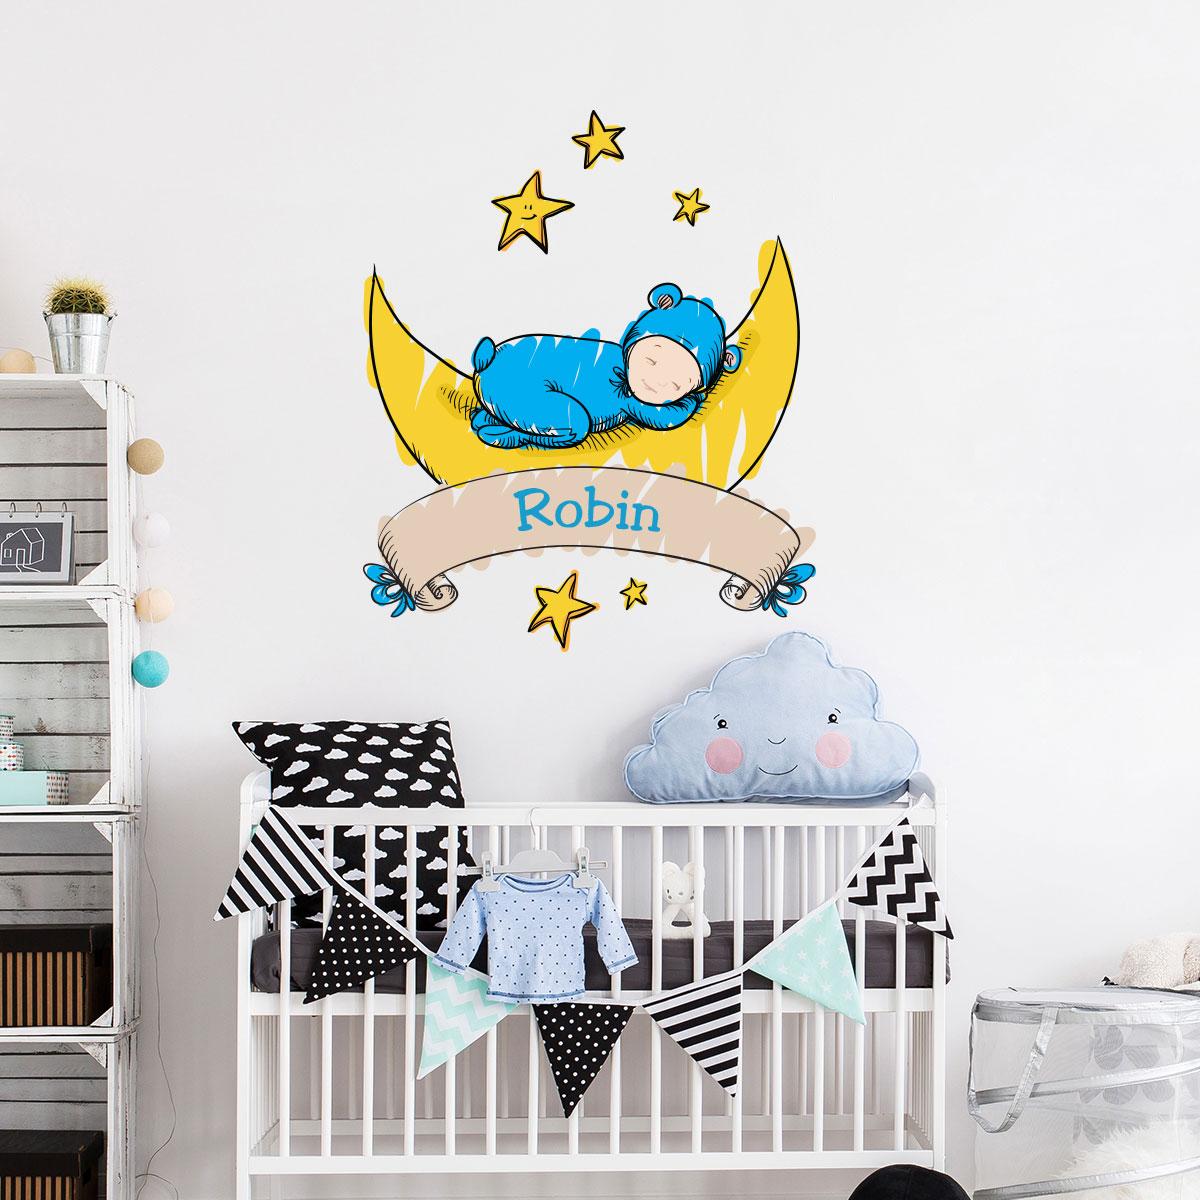 sticker pr nom personnalisable b b fait dodo stickers. Black Bedroom Furniture Sets. Home Design Ideas